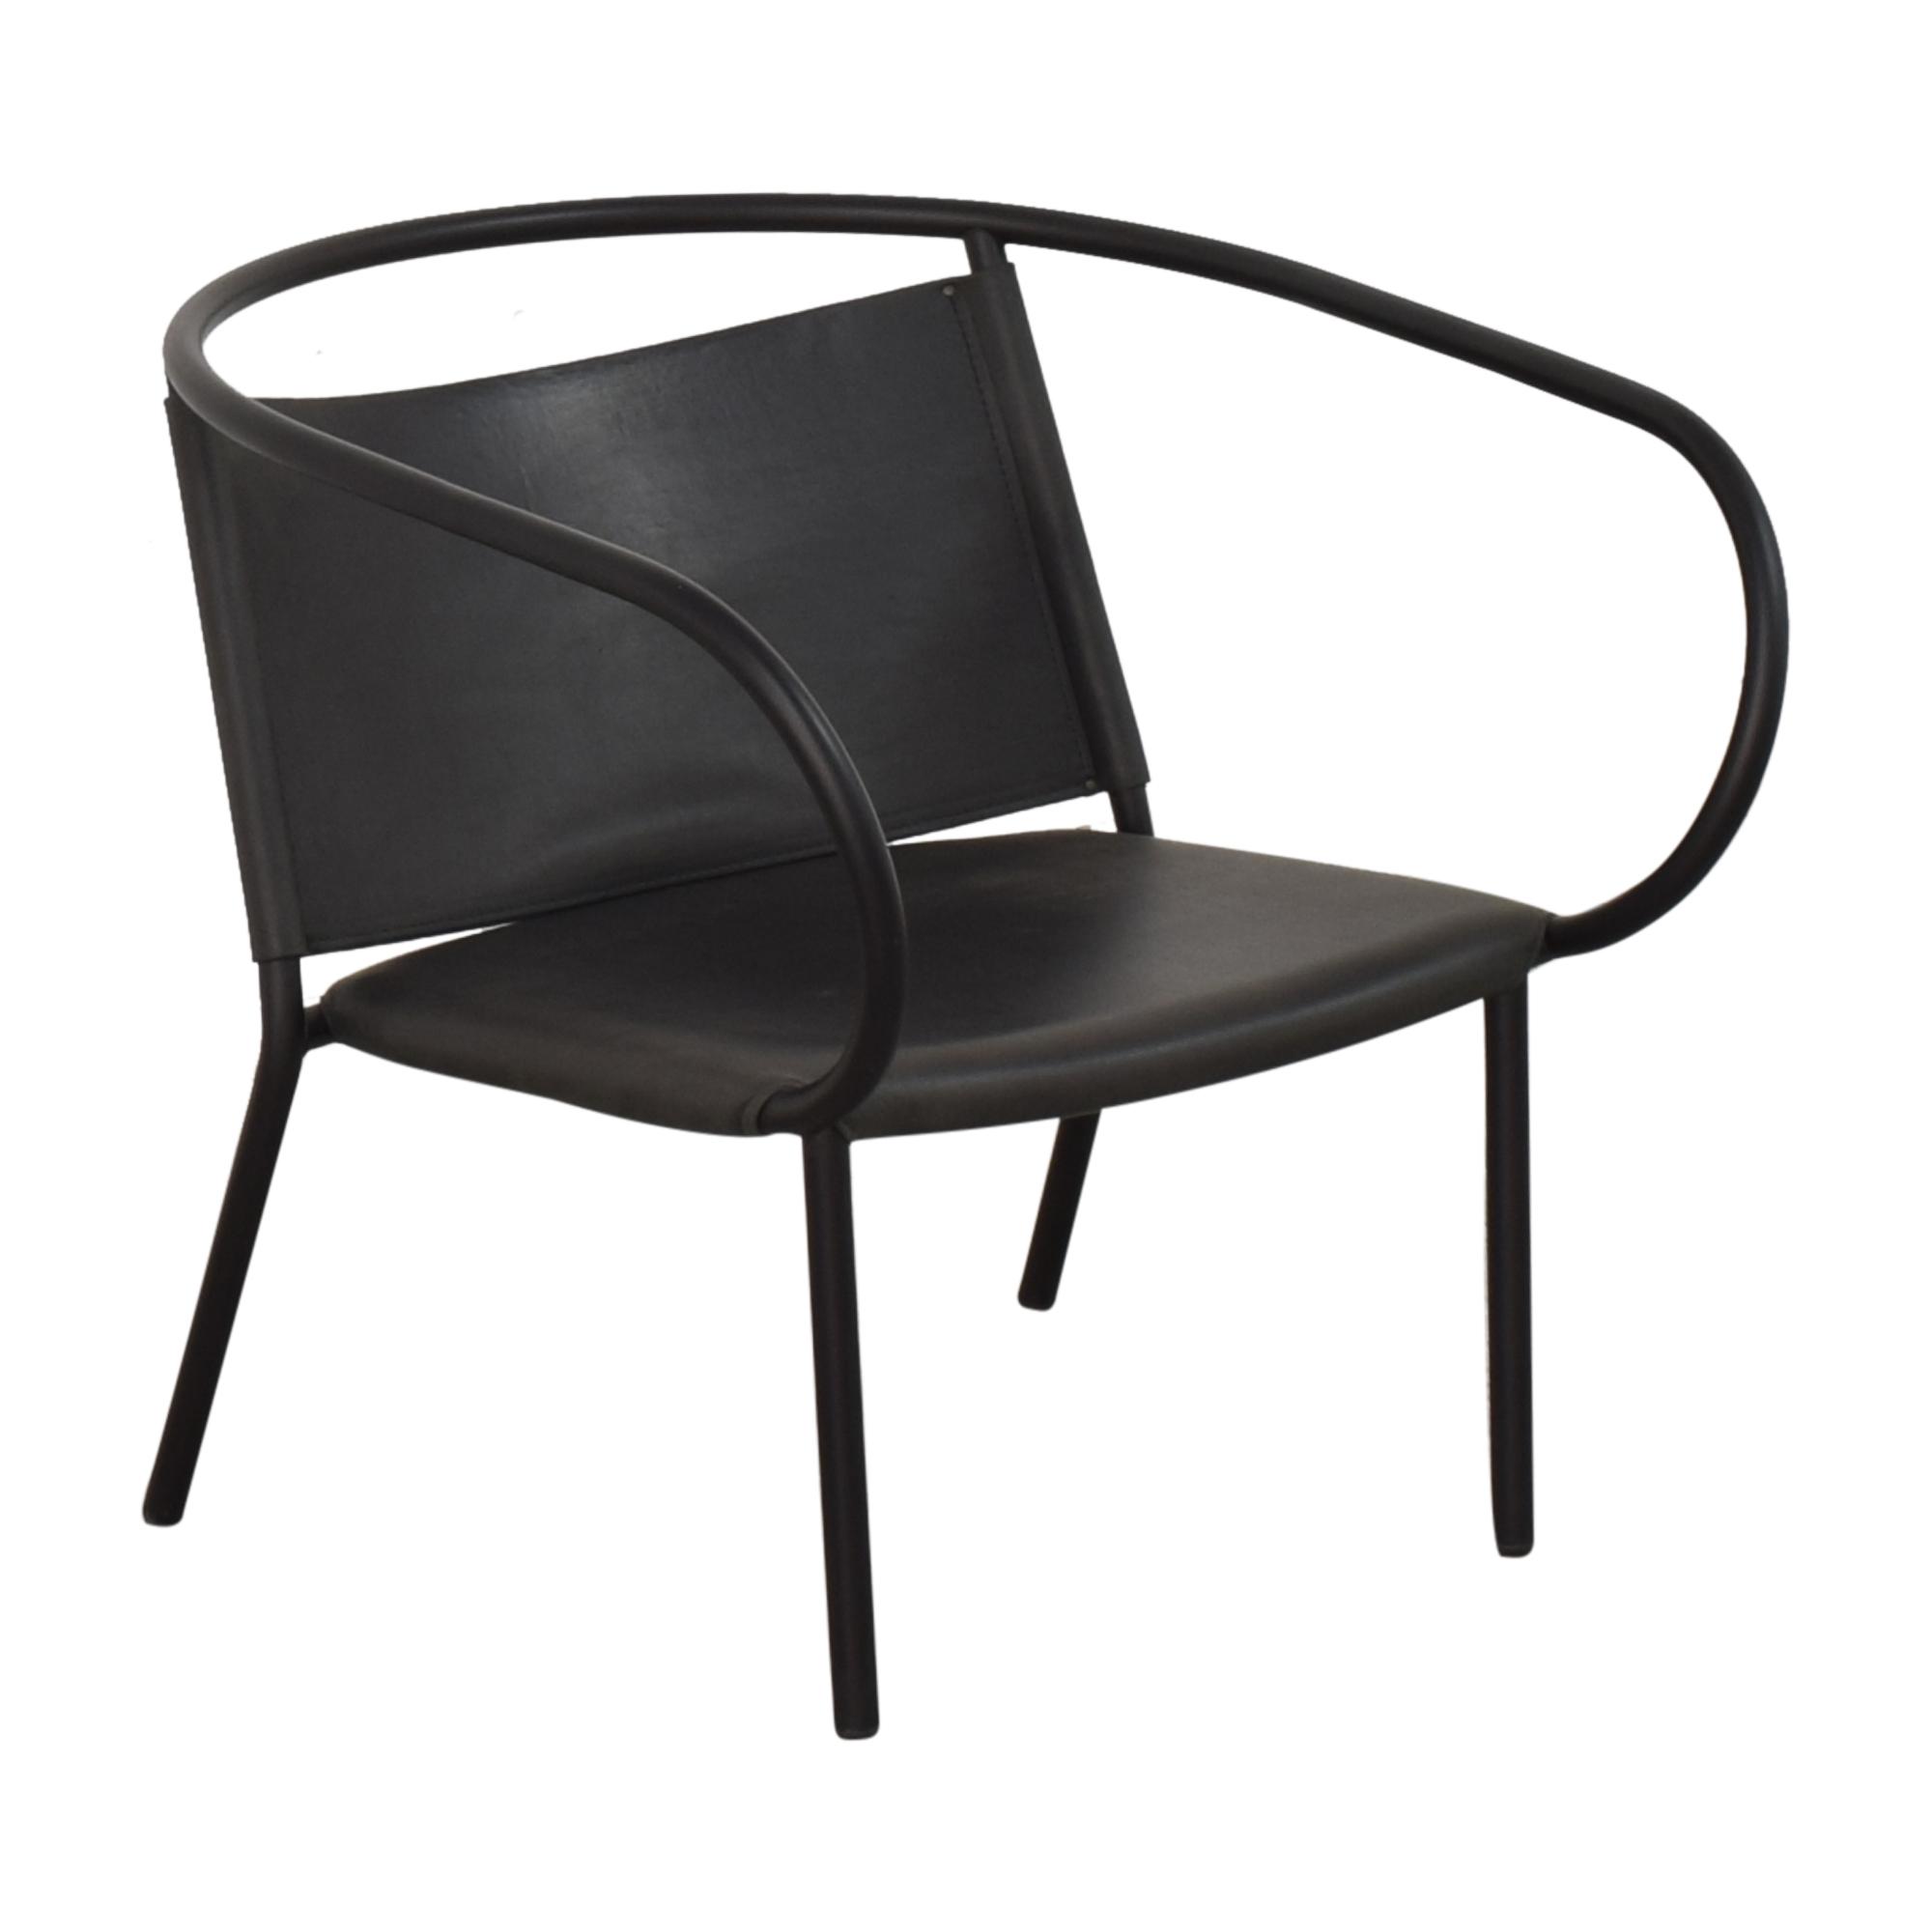 Menu Design Shop Menu Design Shop Afteroom Lounge Chair dark grey & black